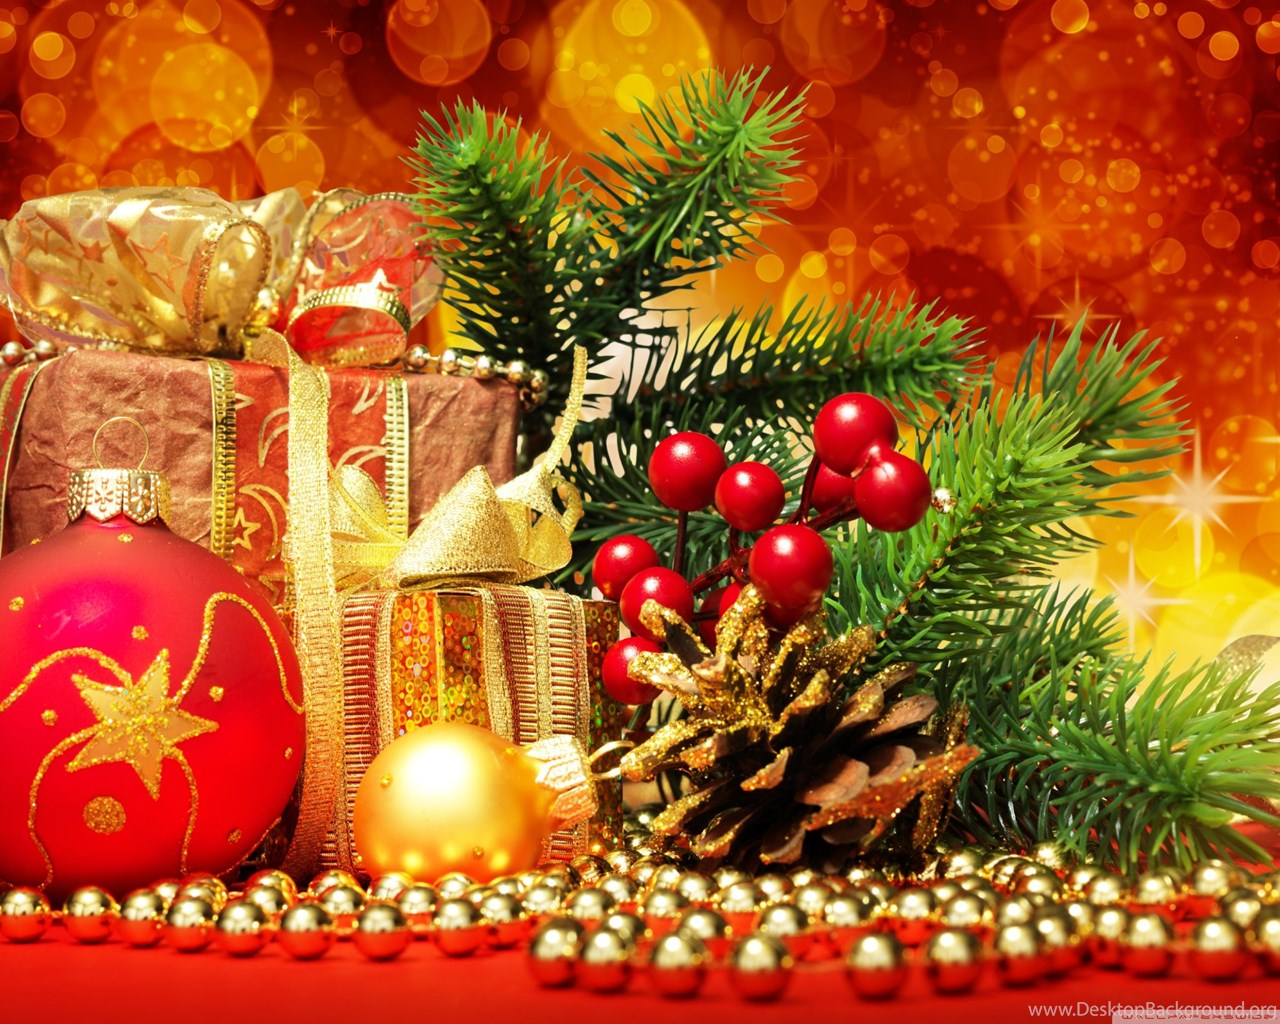 Beautiful Christmas Arrangement Wallpapers Full Hd 2560x1920 Desktop Background